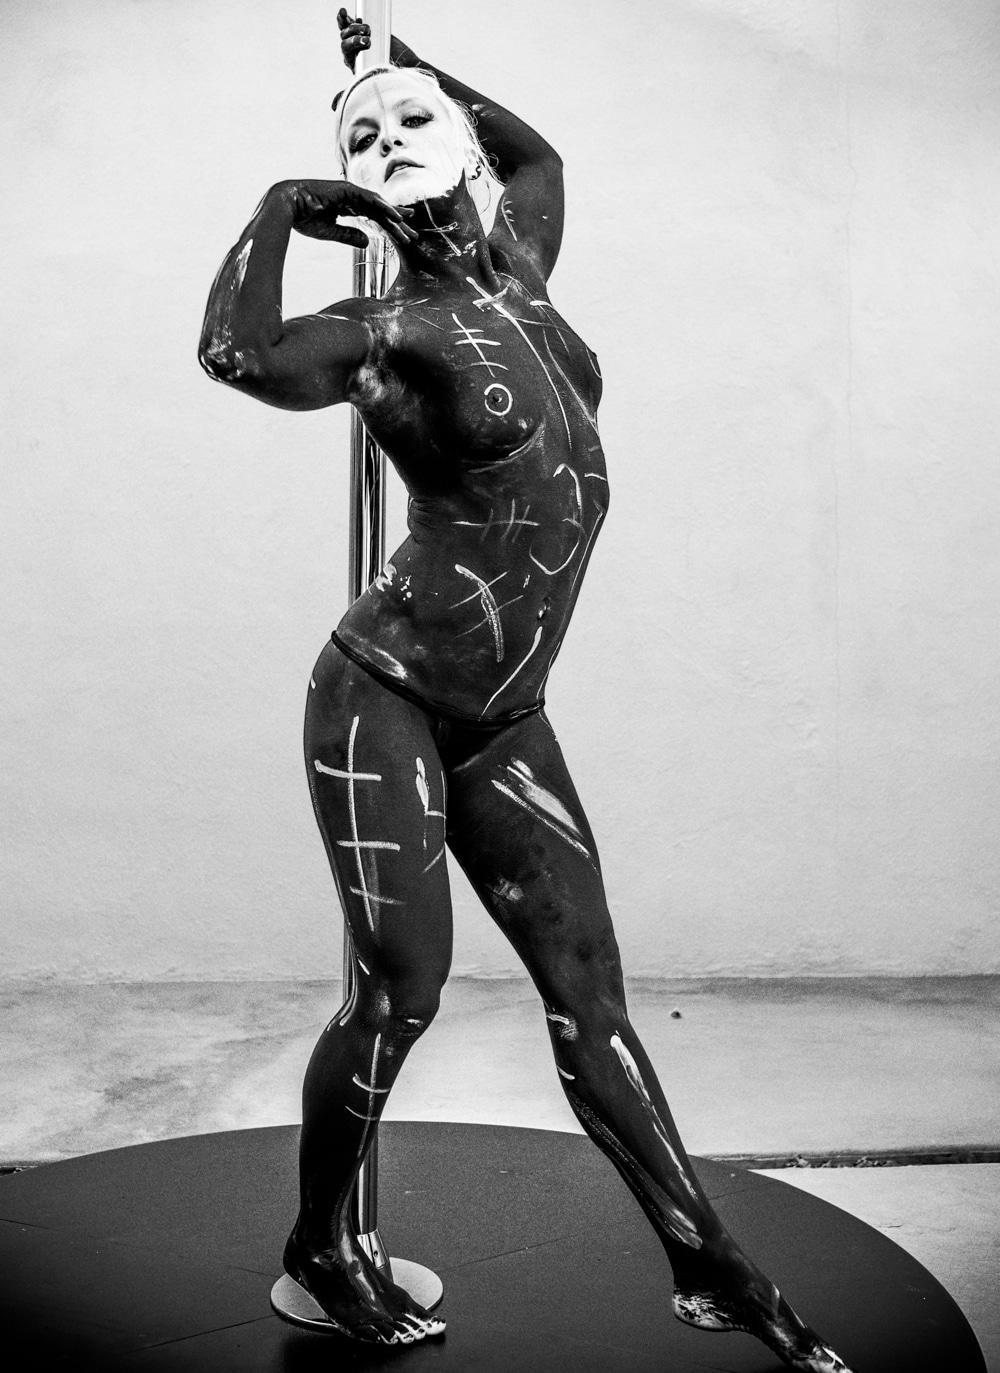 pole_dance_ancient_lines_beylerian_4